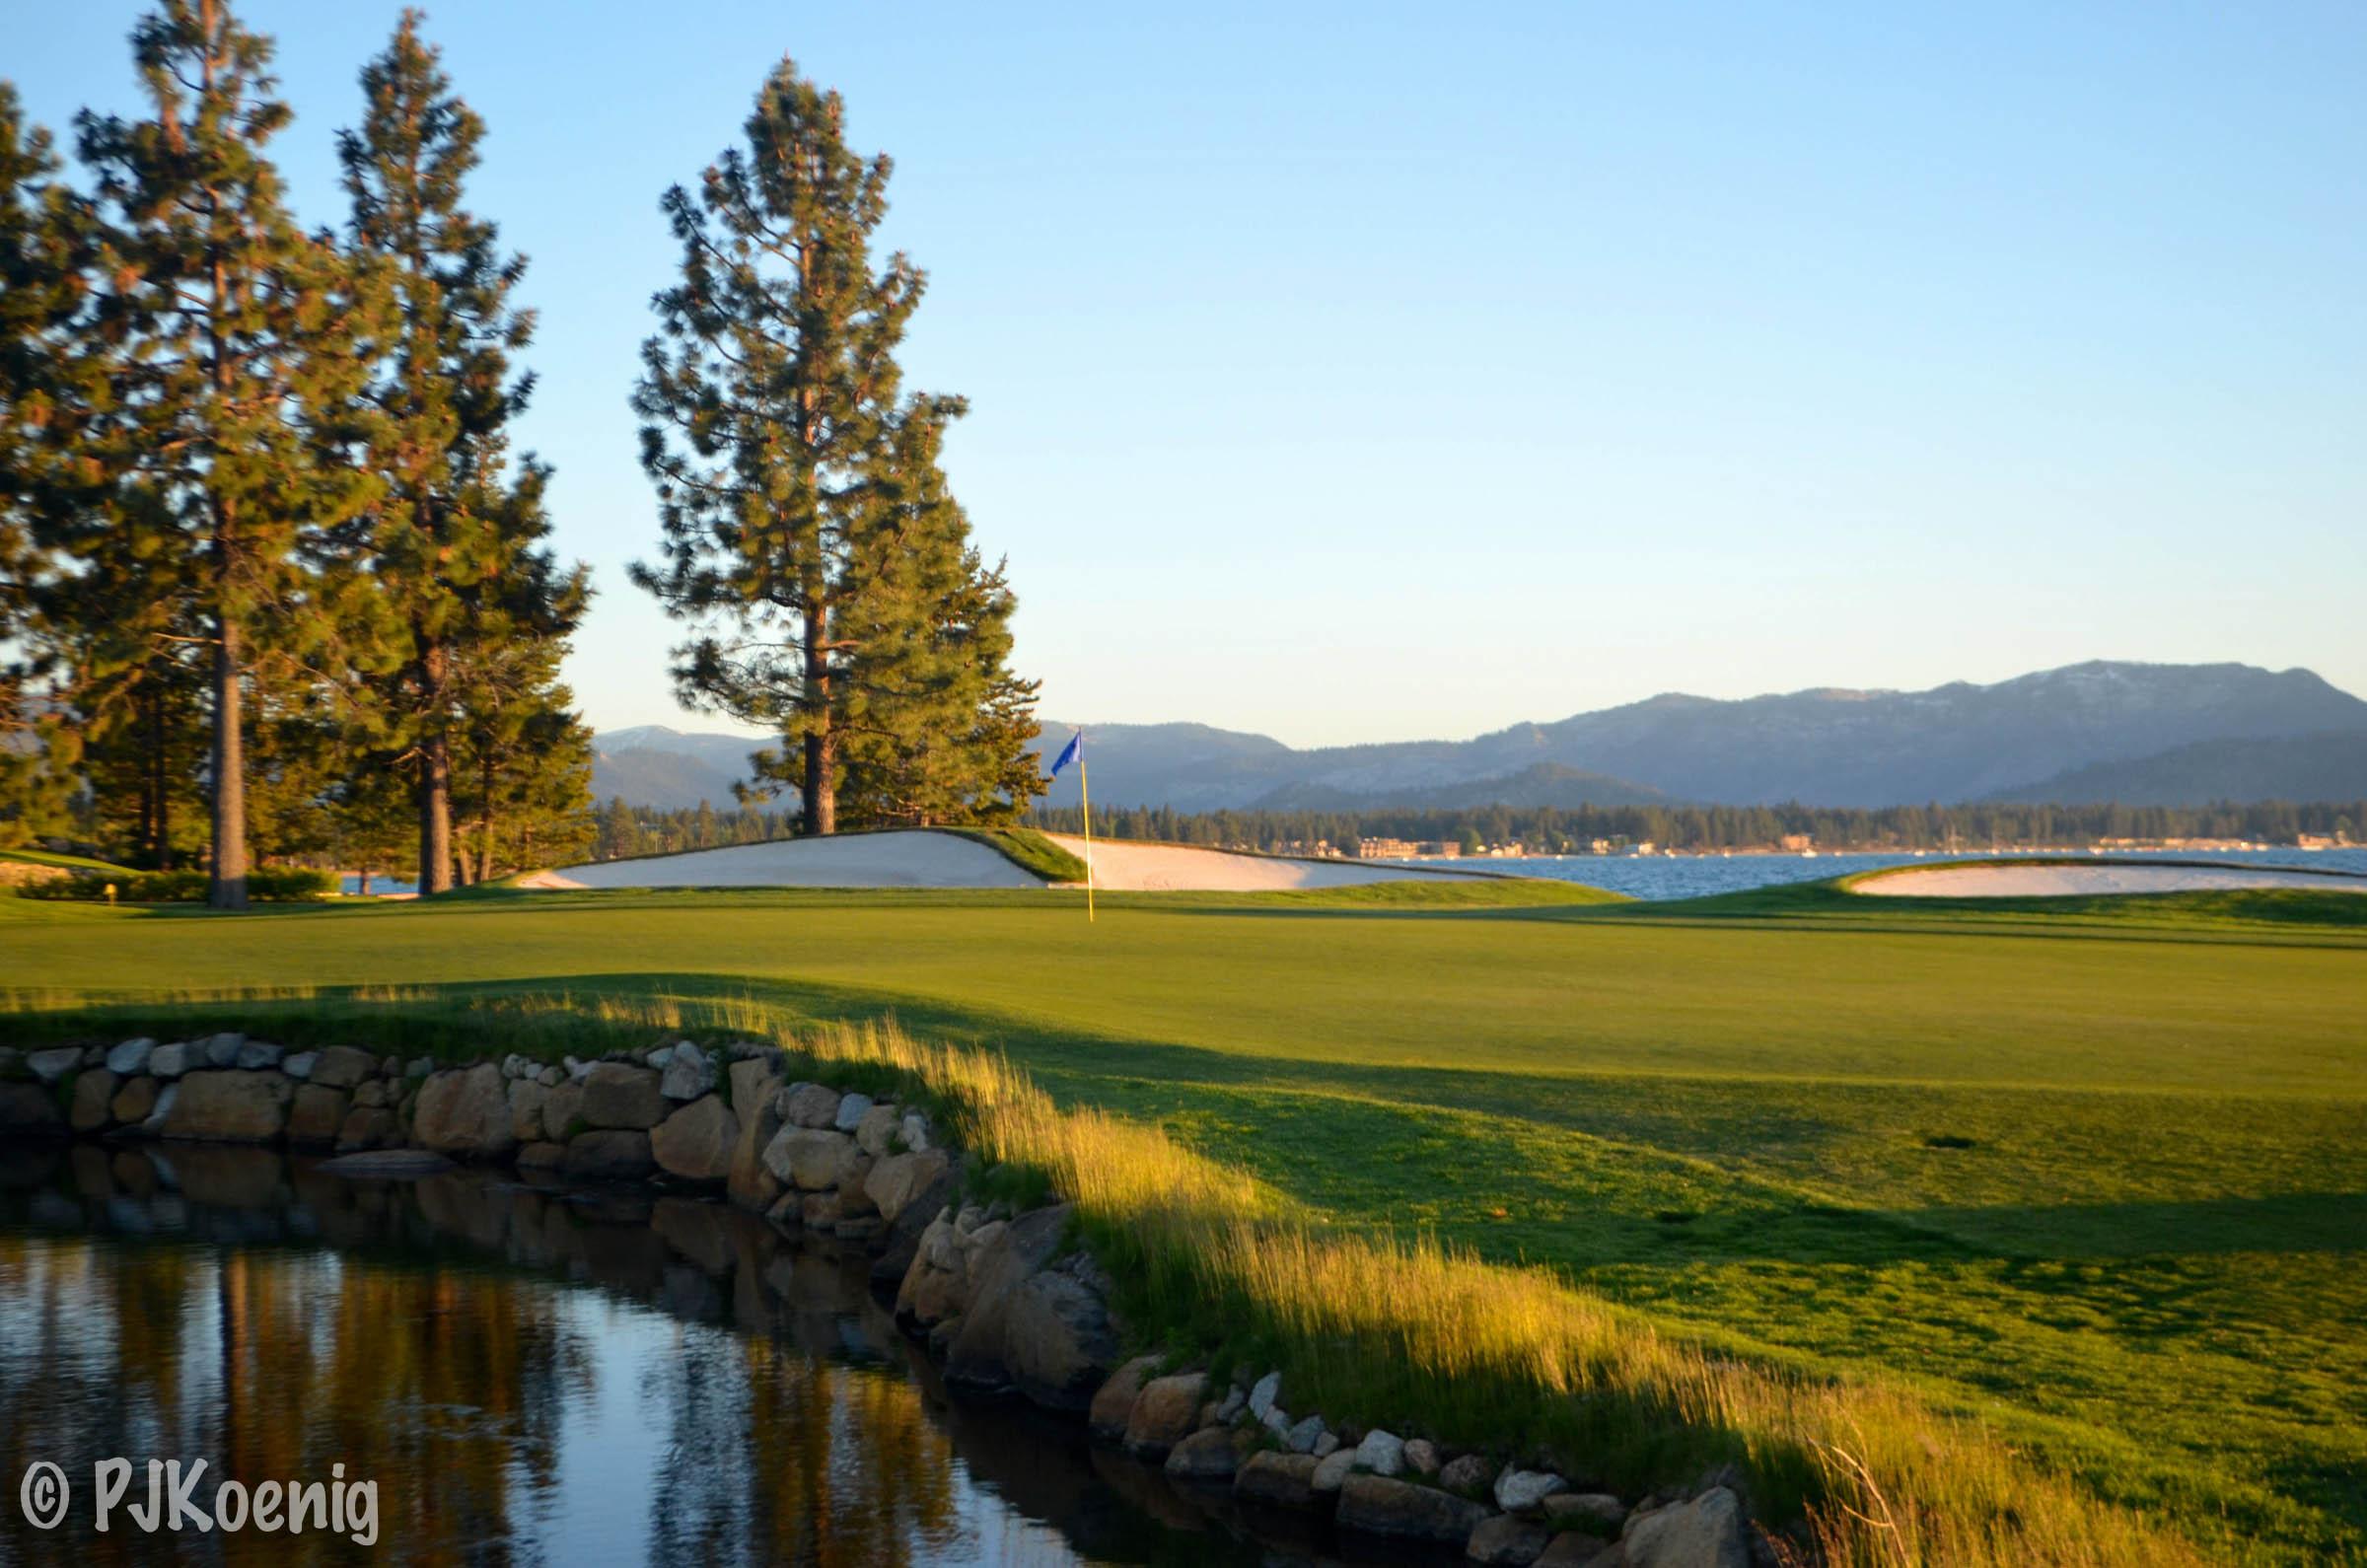 Edgewood Golf Course - Stateline, NV